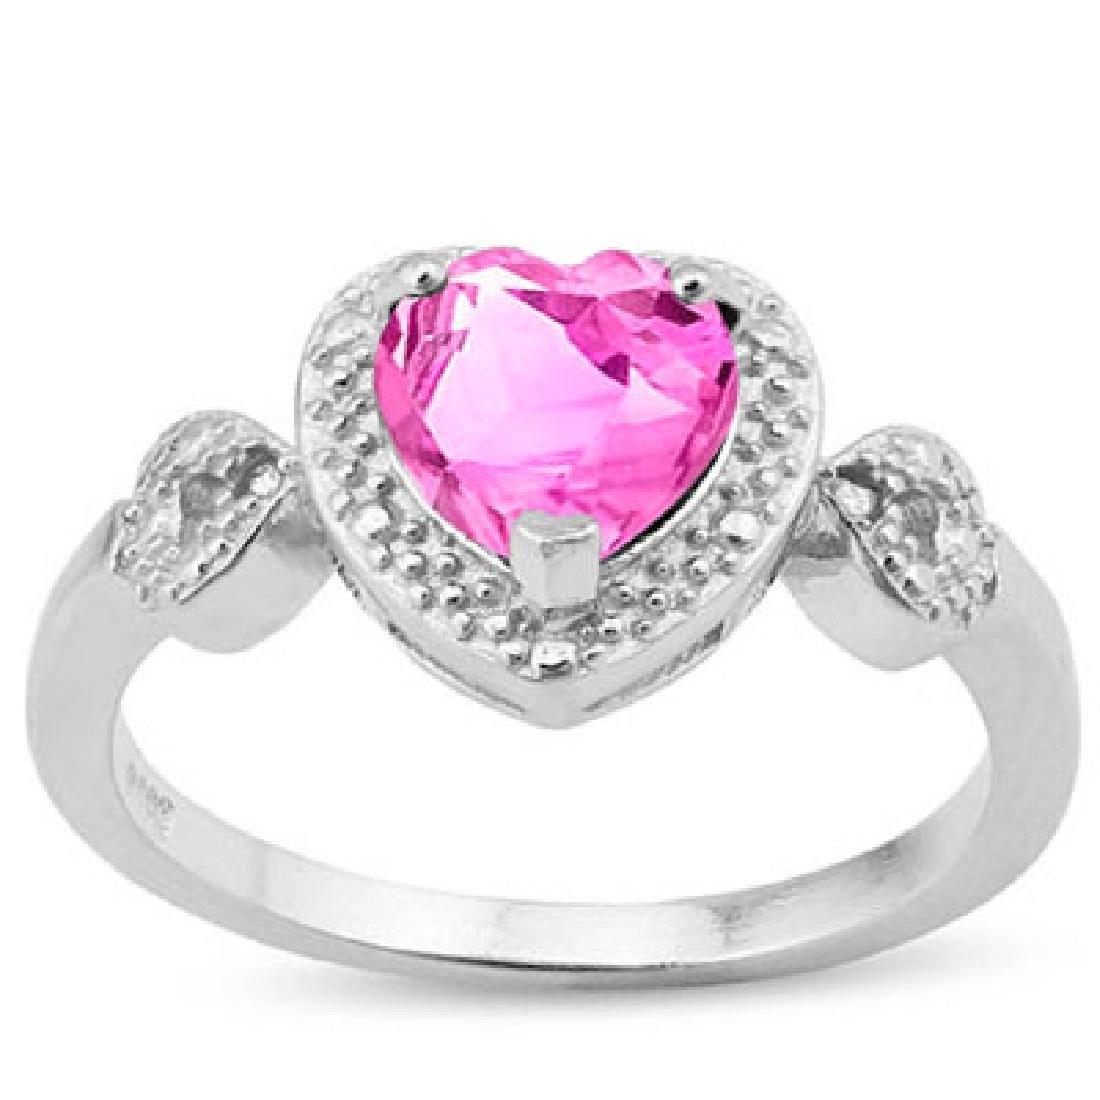 1 2/5 CARAT CREATED PINK SAPPHIRE & DIAMOND 925 STERLIN